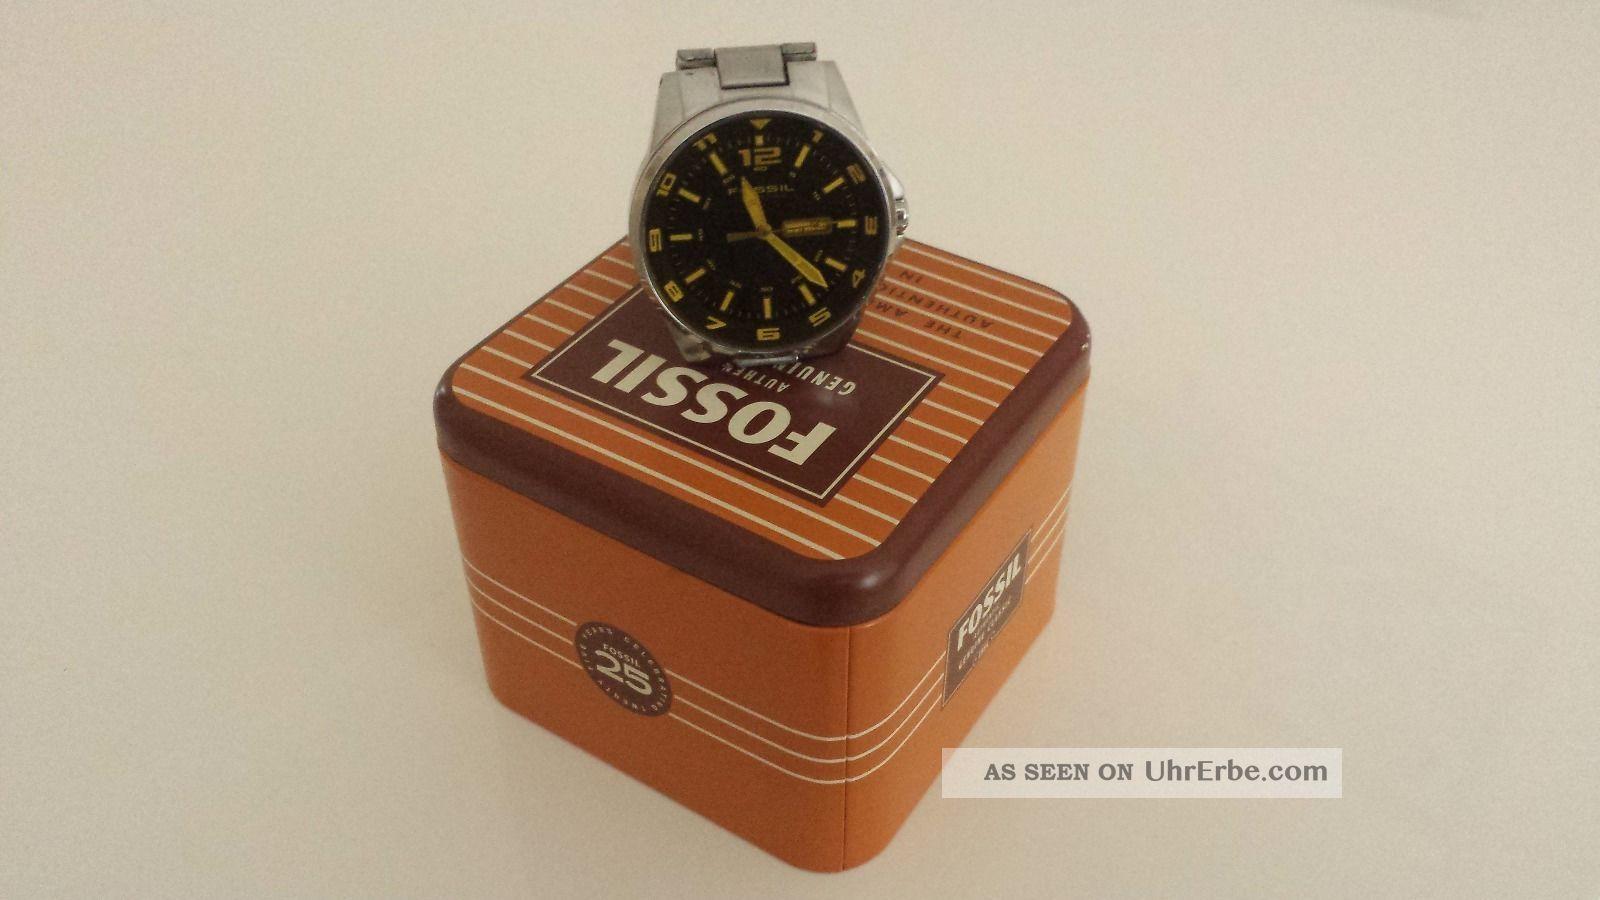 Fossil Herren - Uhr Armbanduhren Bild